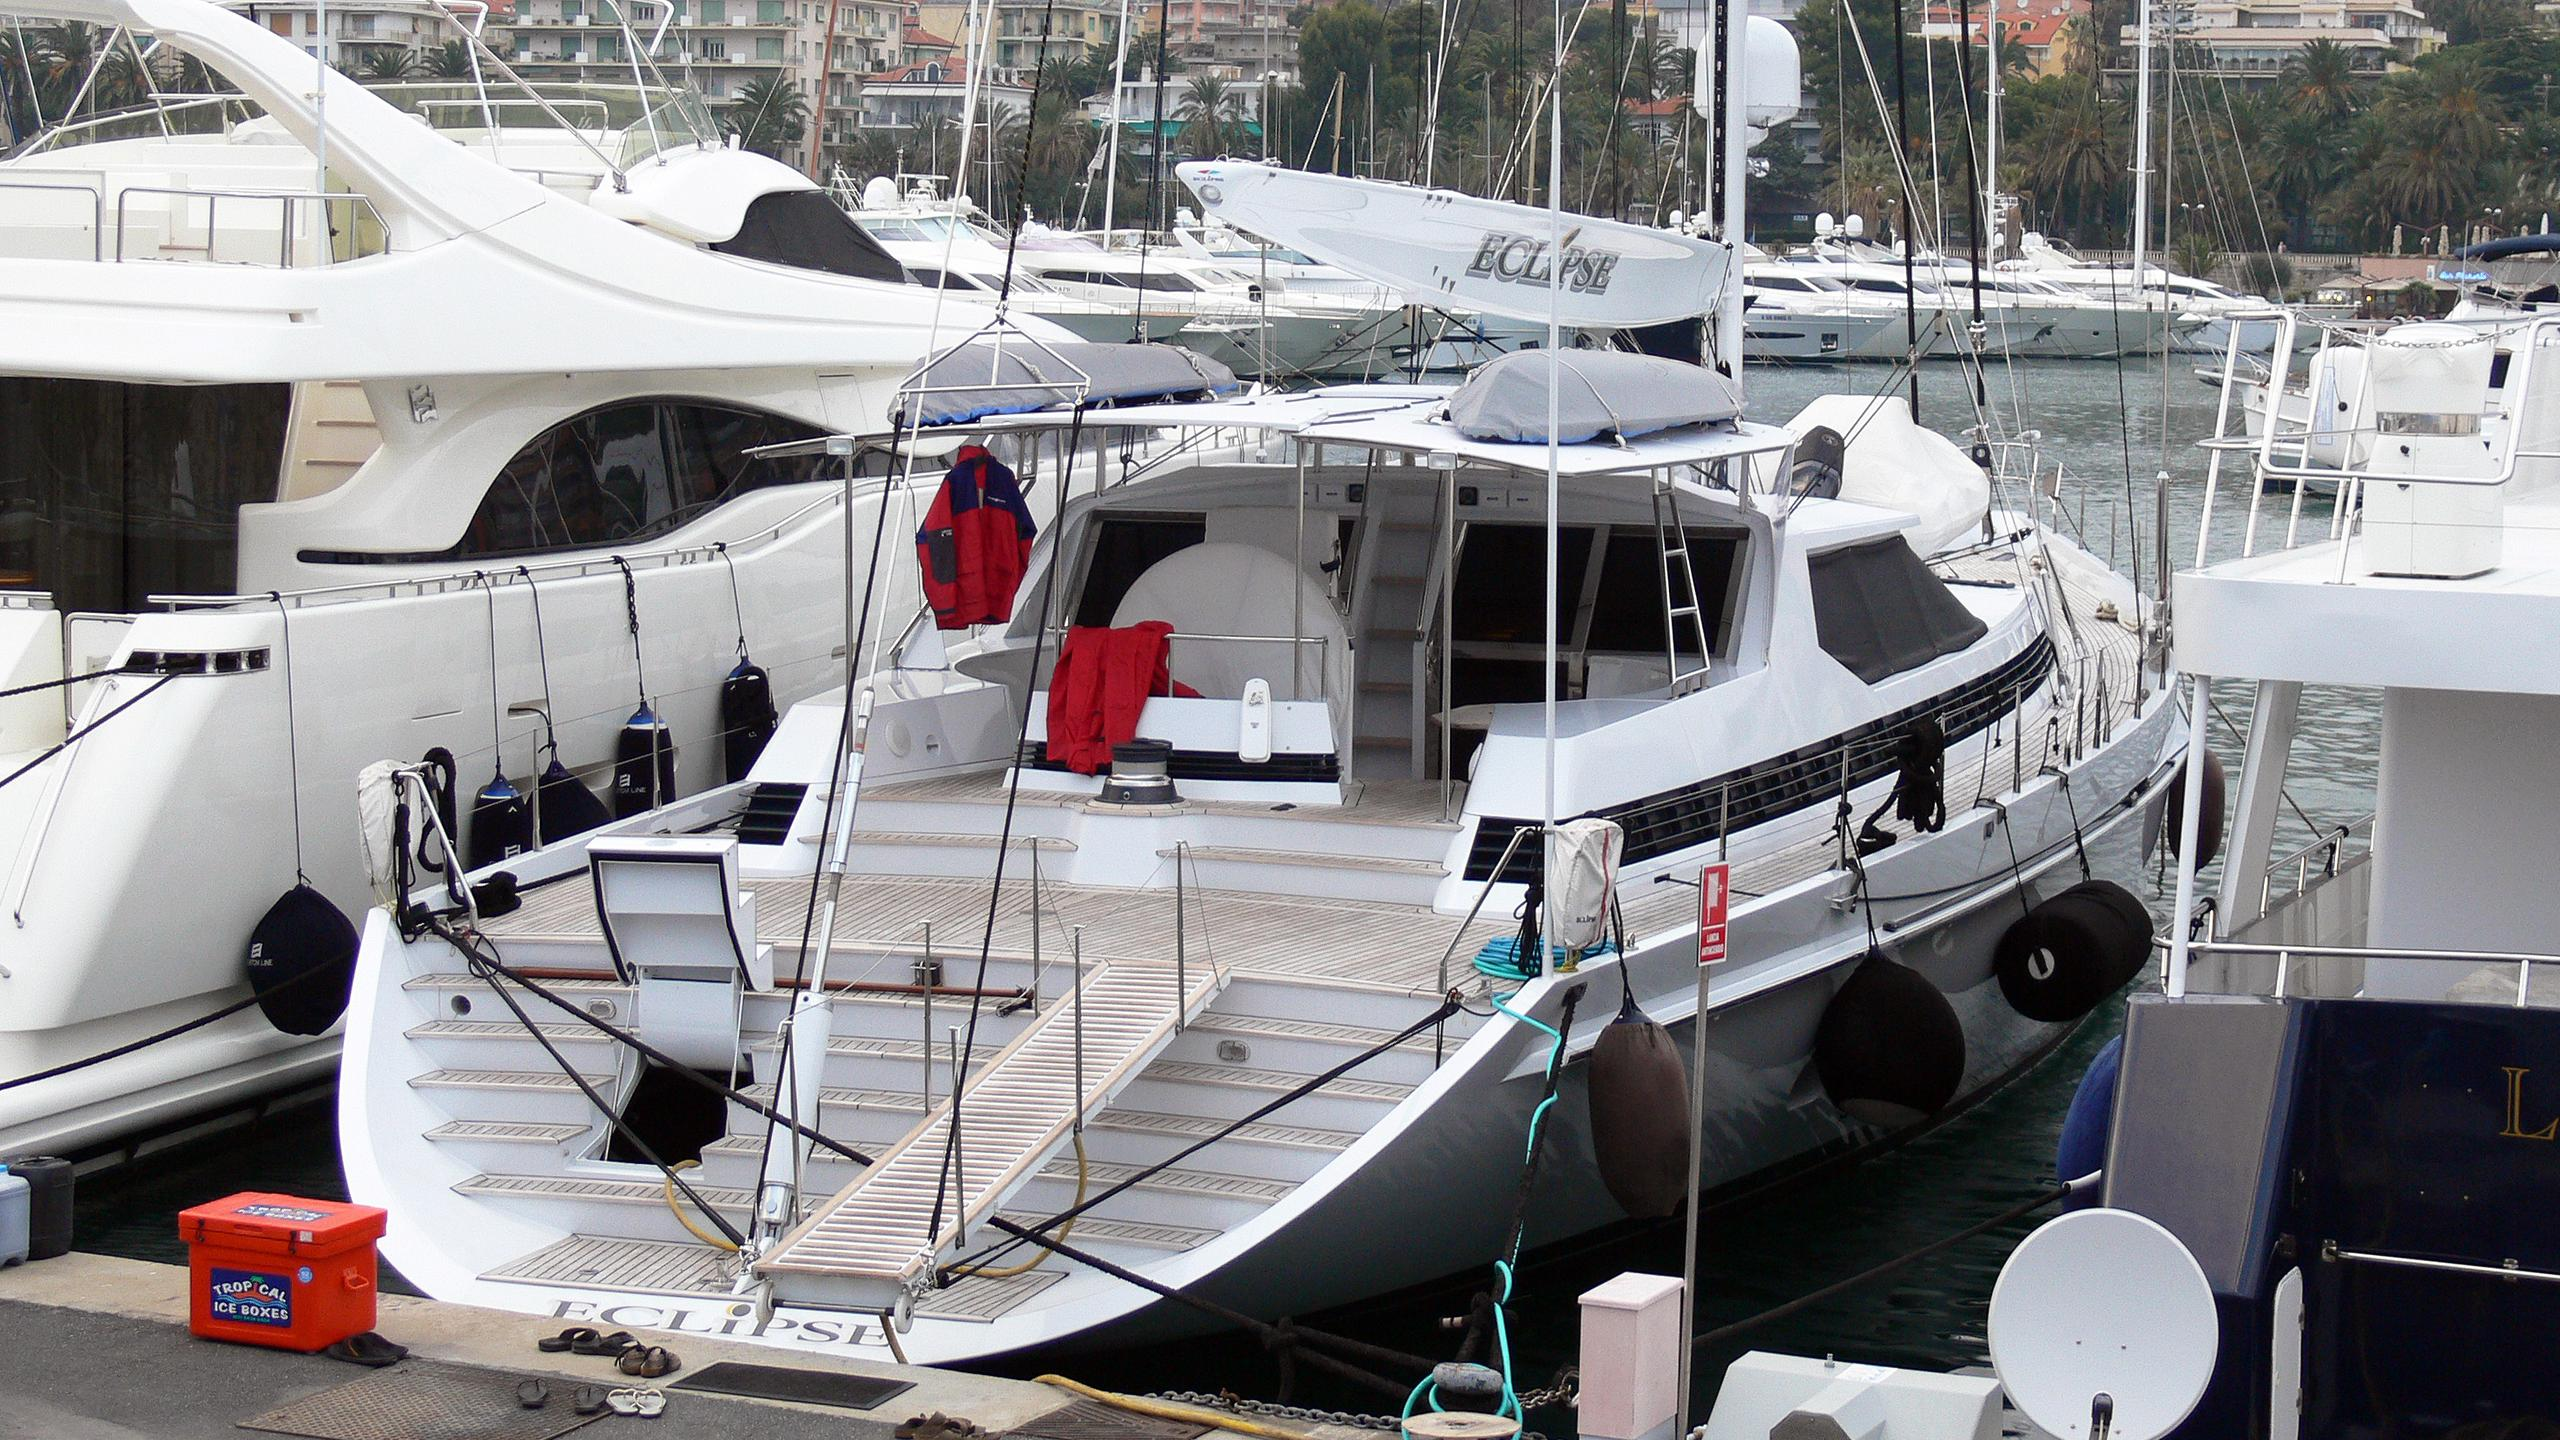 eclipse-motor-yacht-alloy-1991-33m-stern